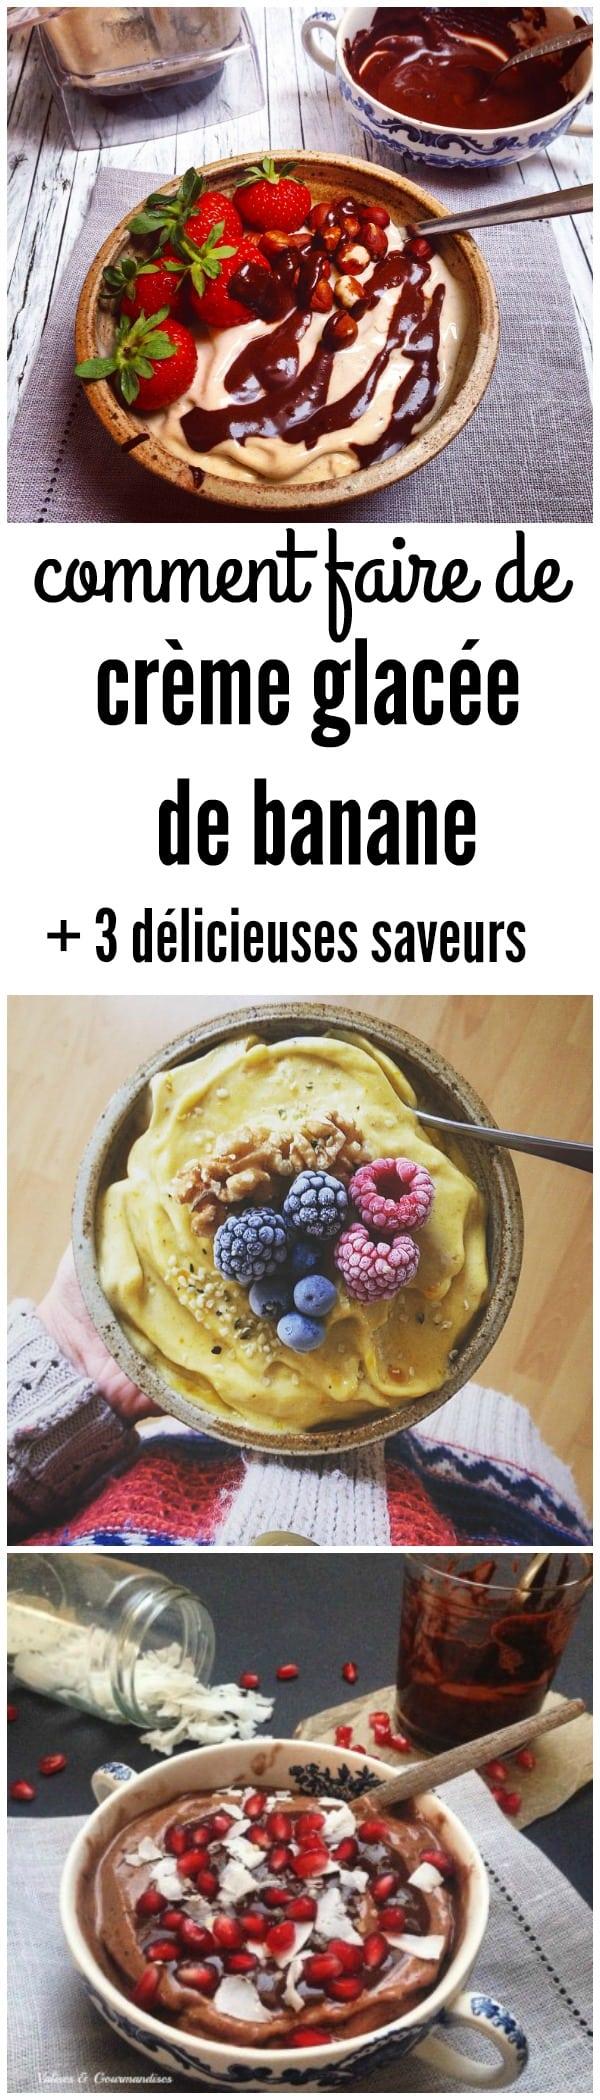 Crème glacée de banane + 3 délicieuses saveurs